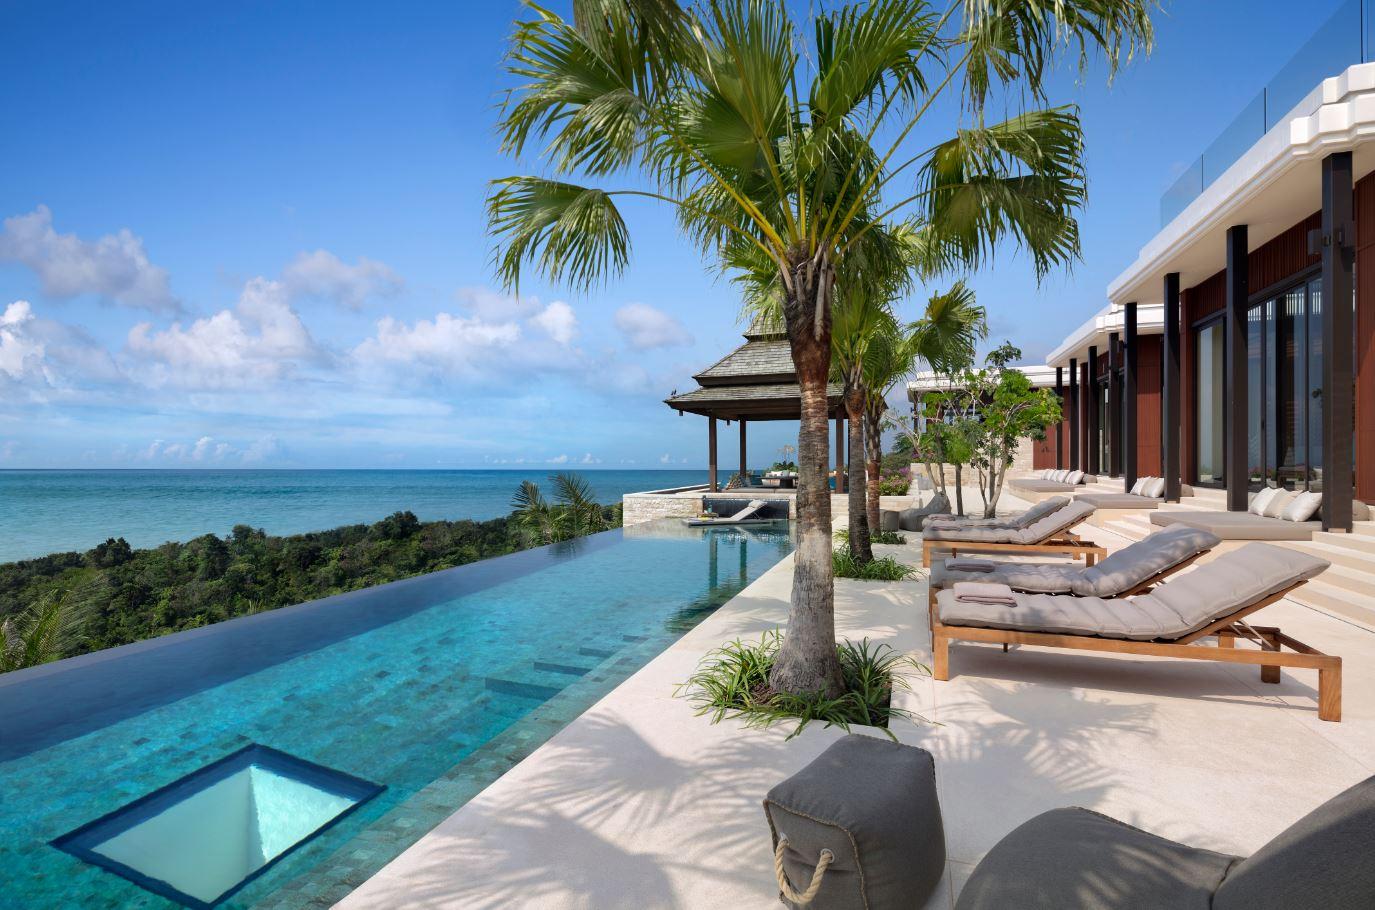 Anantara Layan Phuket Resort - Top 10 best luxury resorts and hotels in Phuket